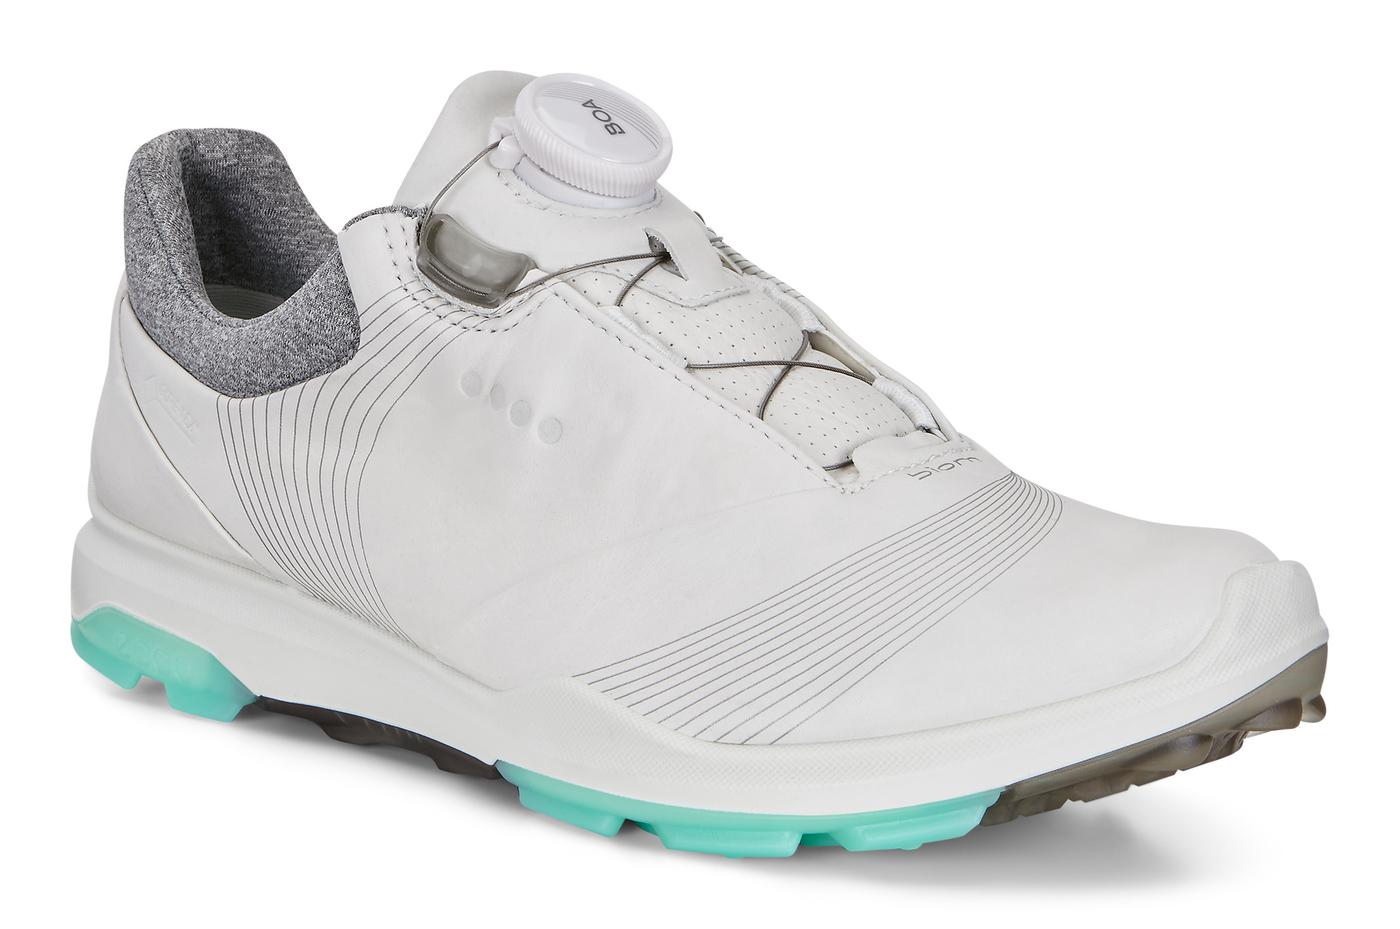 ECCO 여성 골프화 바이옴 하이브리드3 고어텍스